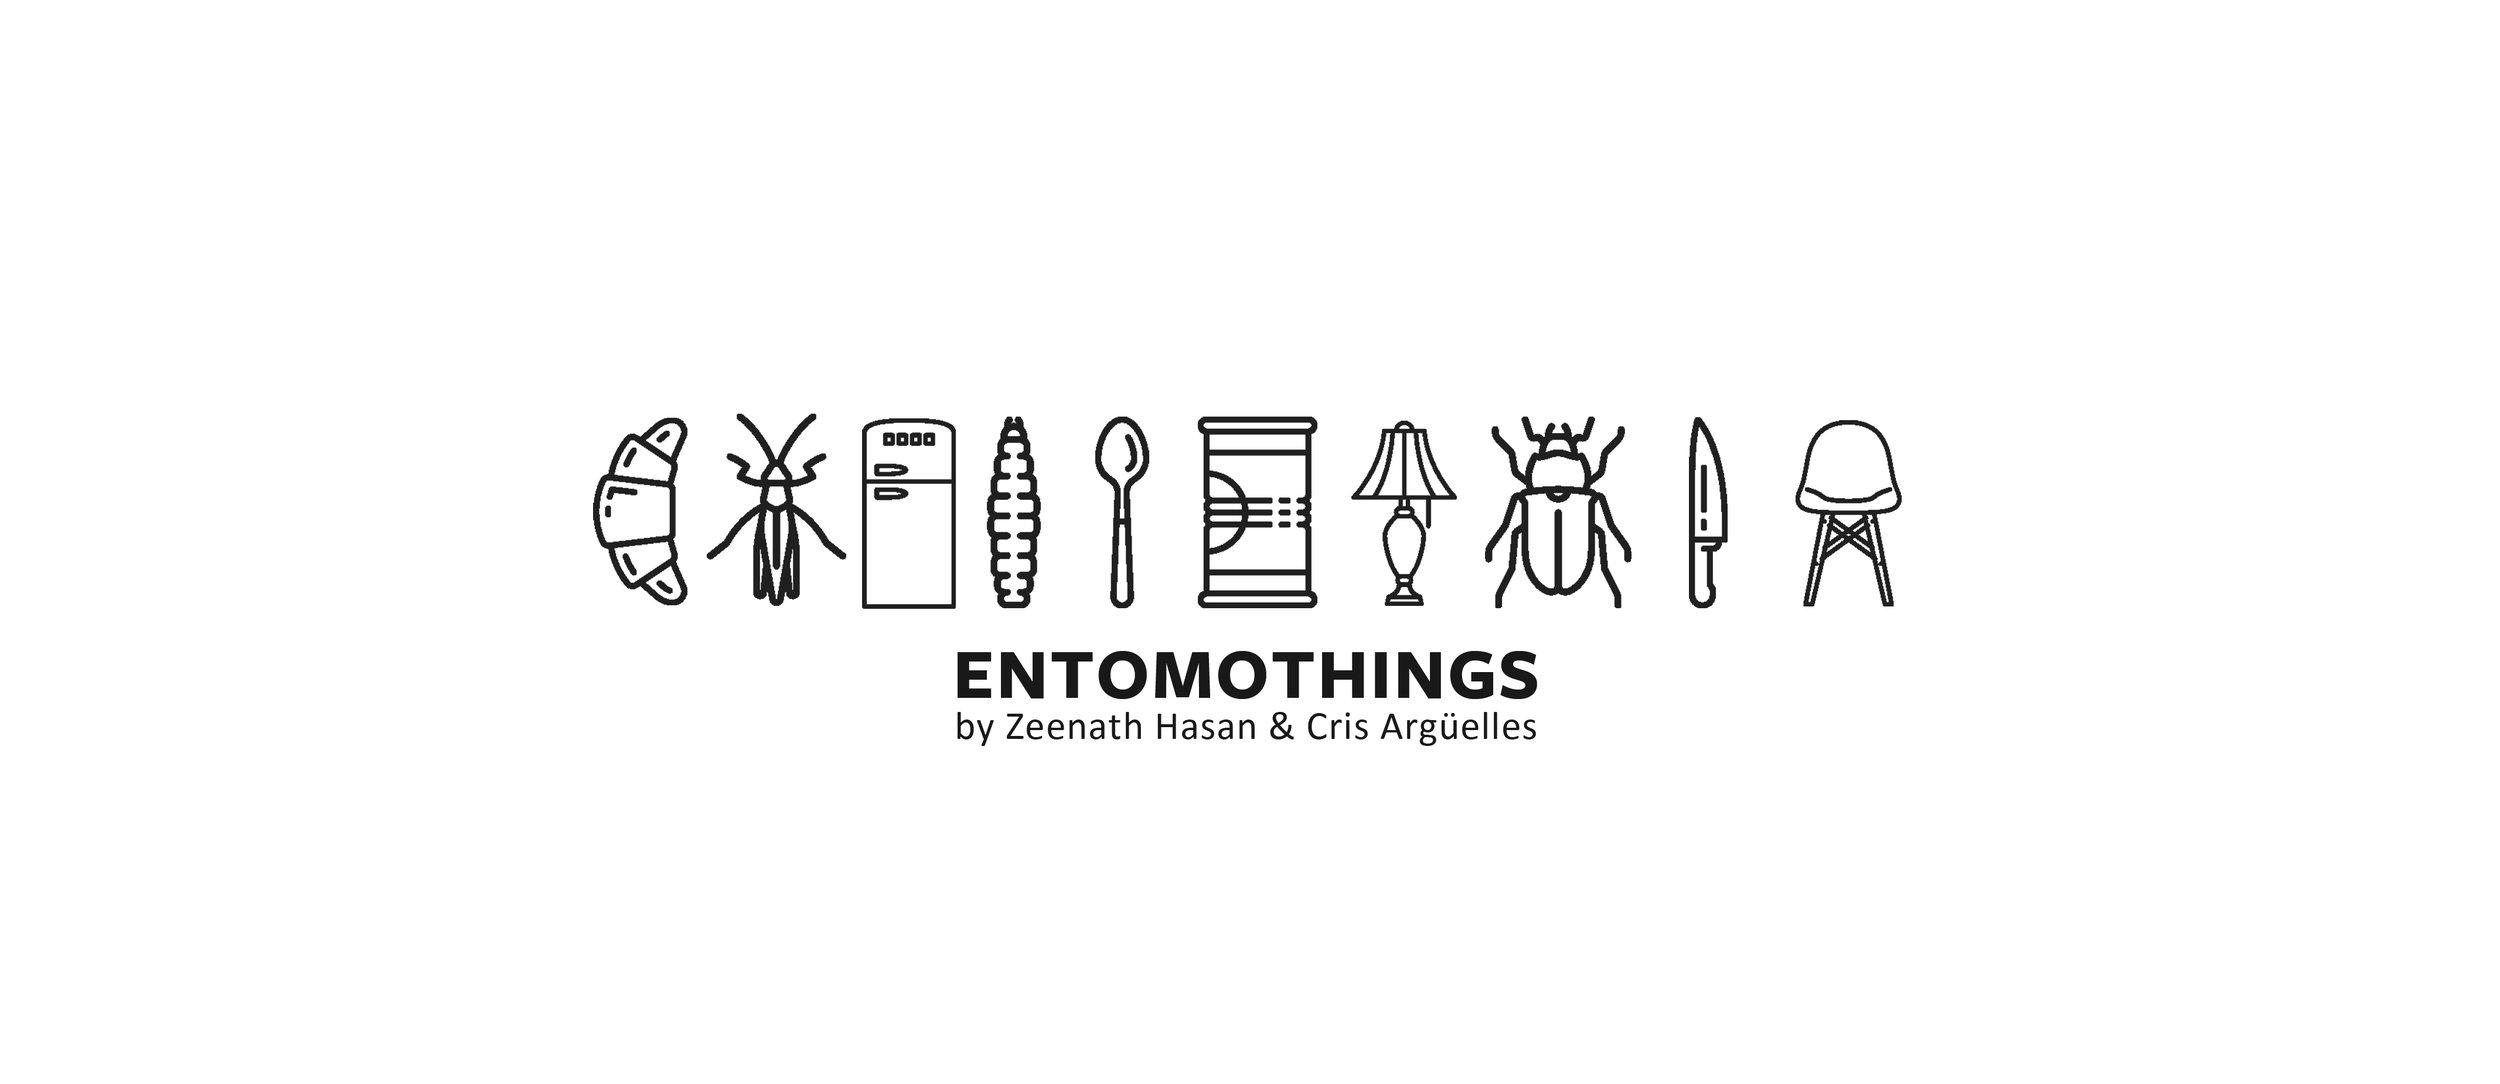 entomothings_banner.jpg